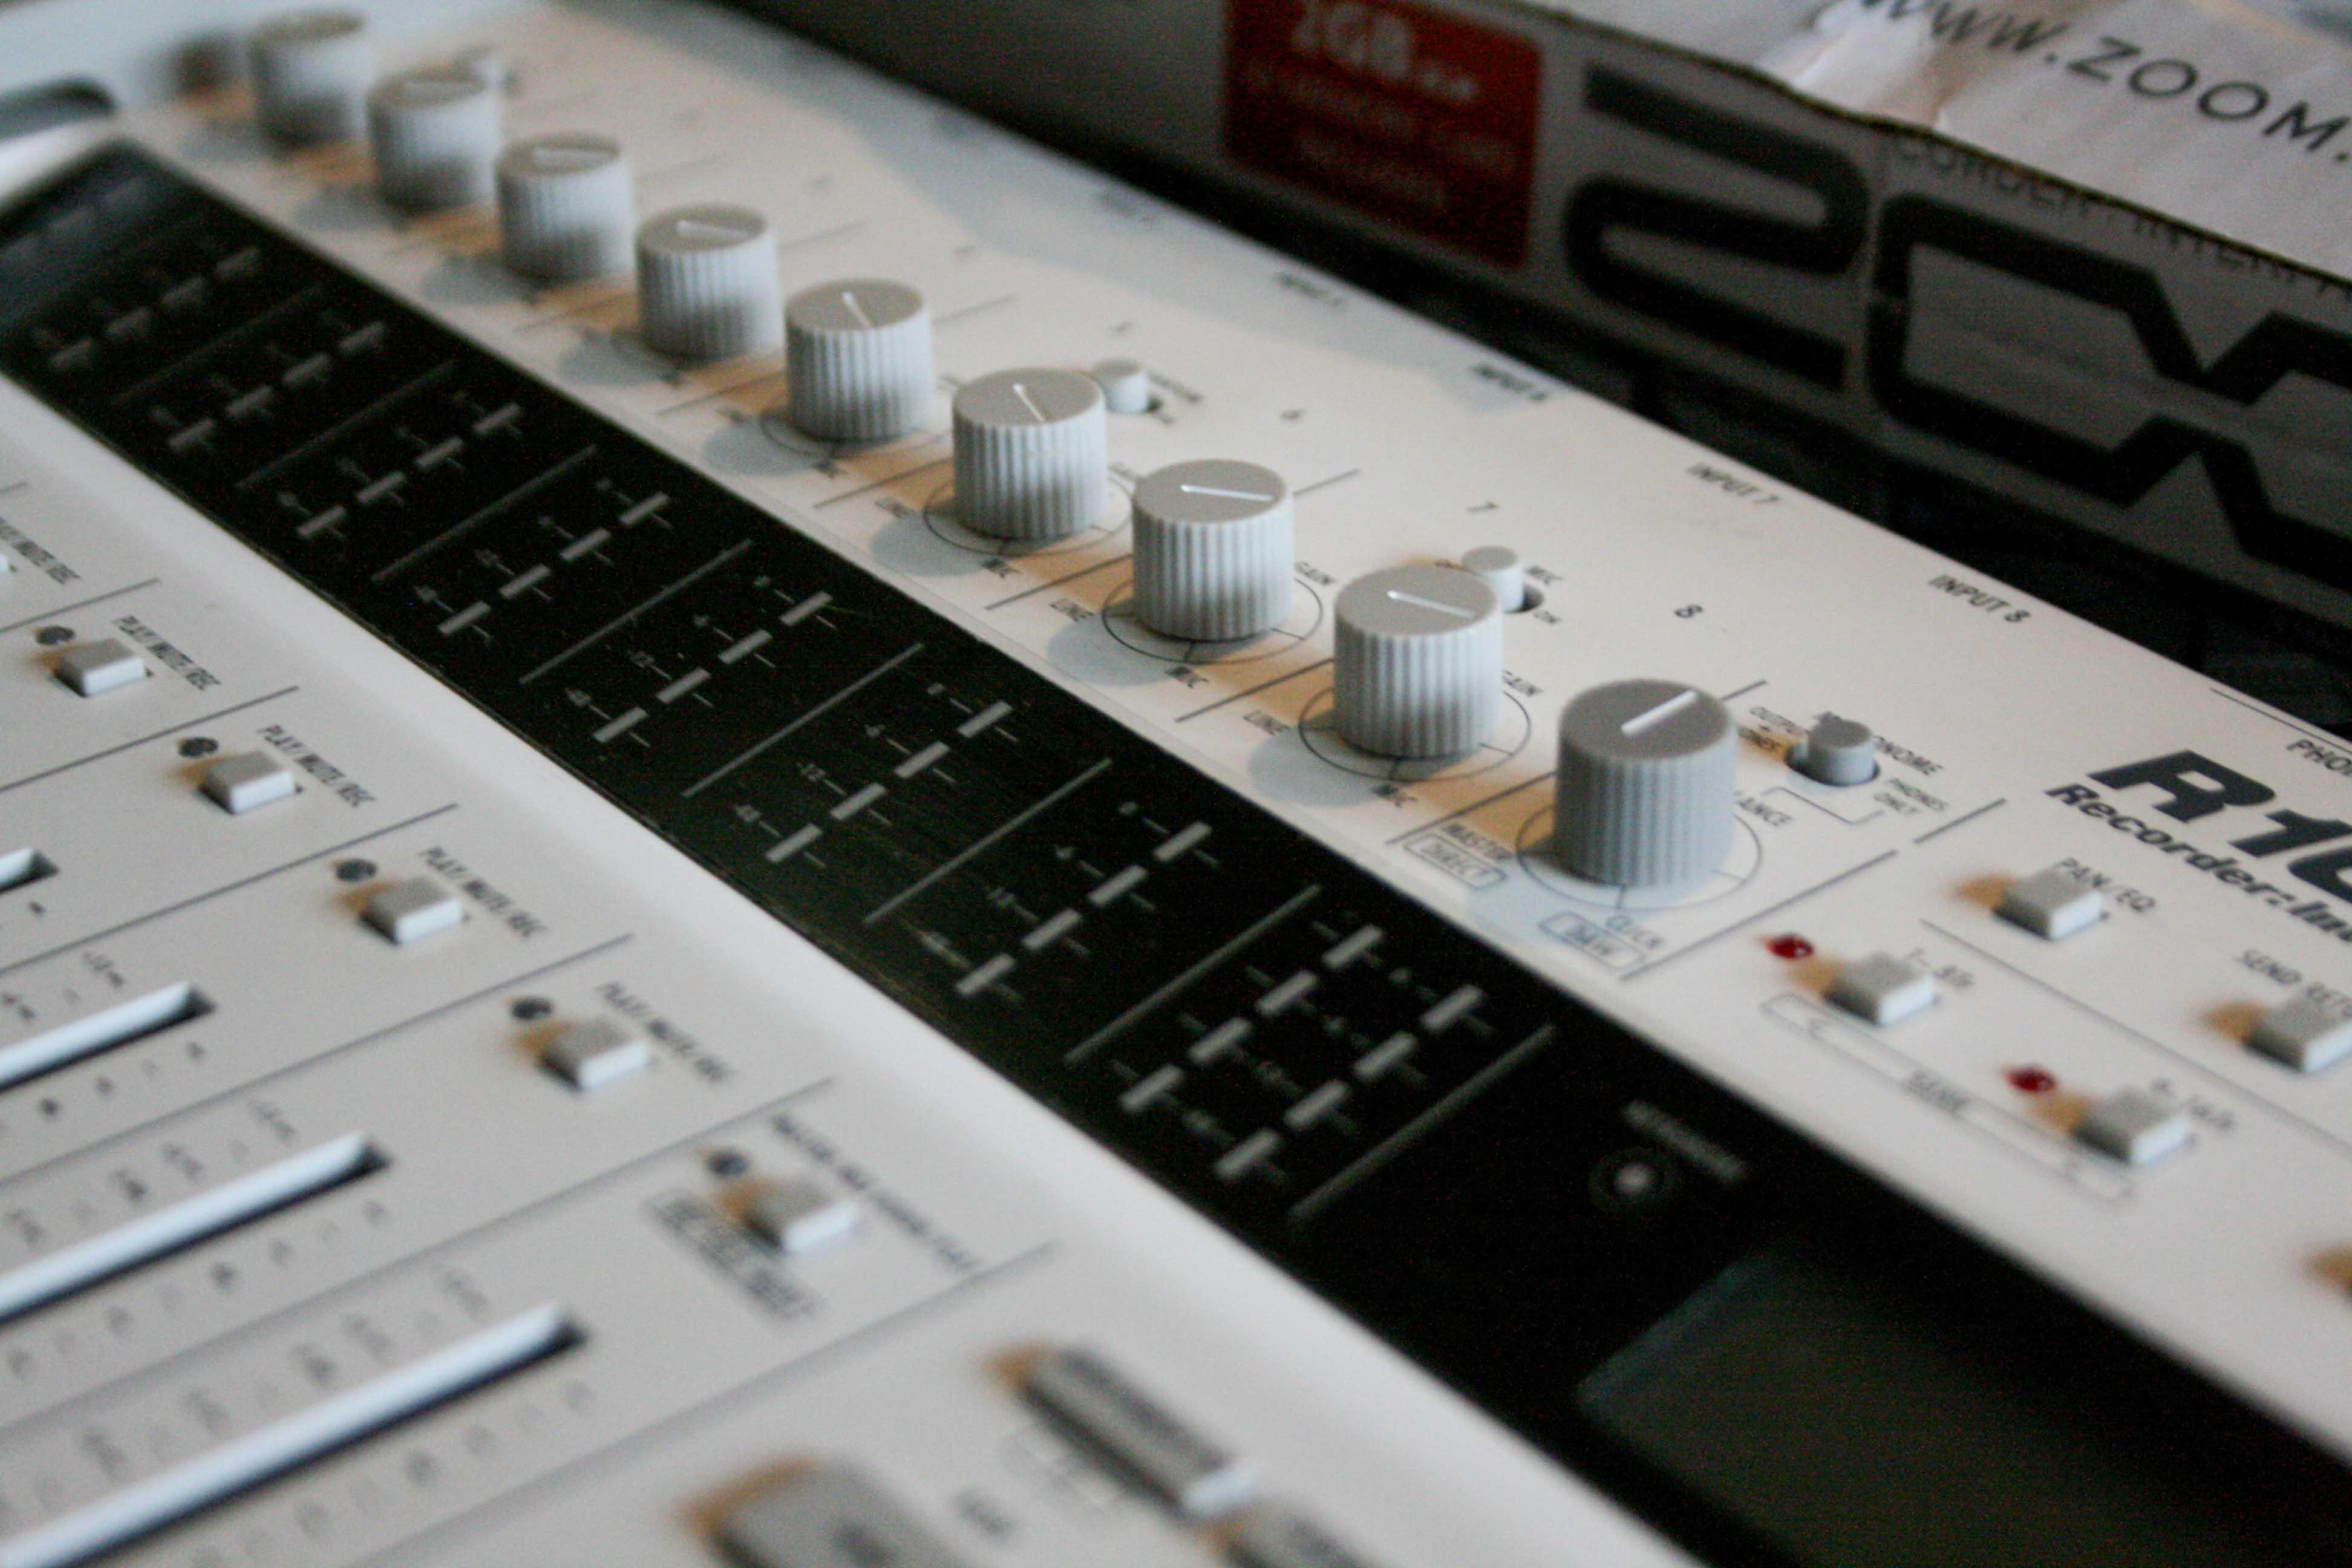 photo zoom r16 zoom r16 12073 1572411 audiofanzine. Black Bedroom Furniture Sets. Home Design Ideas